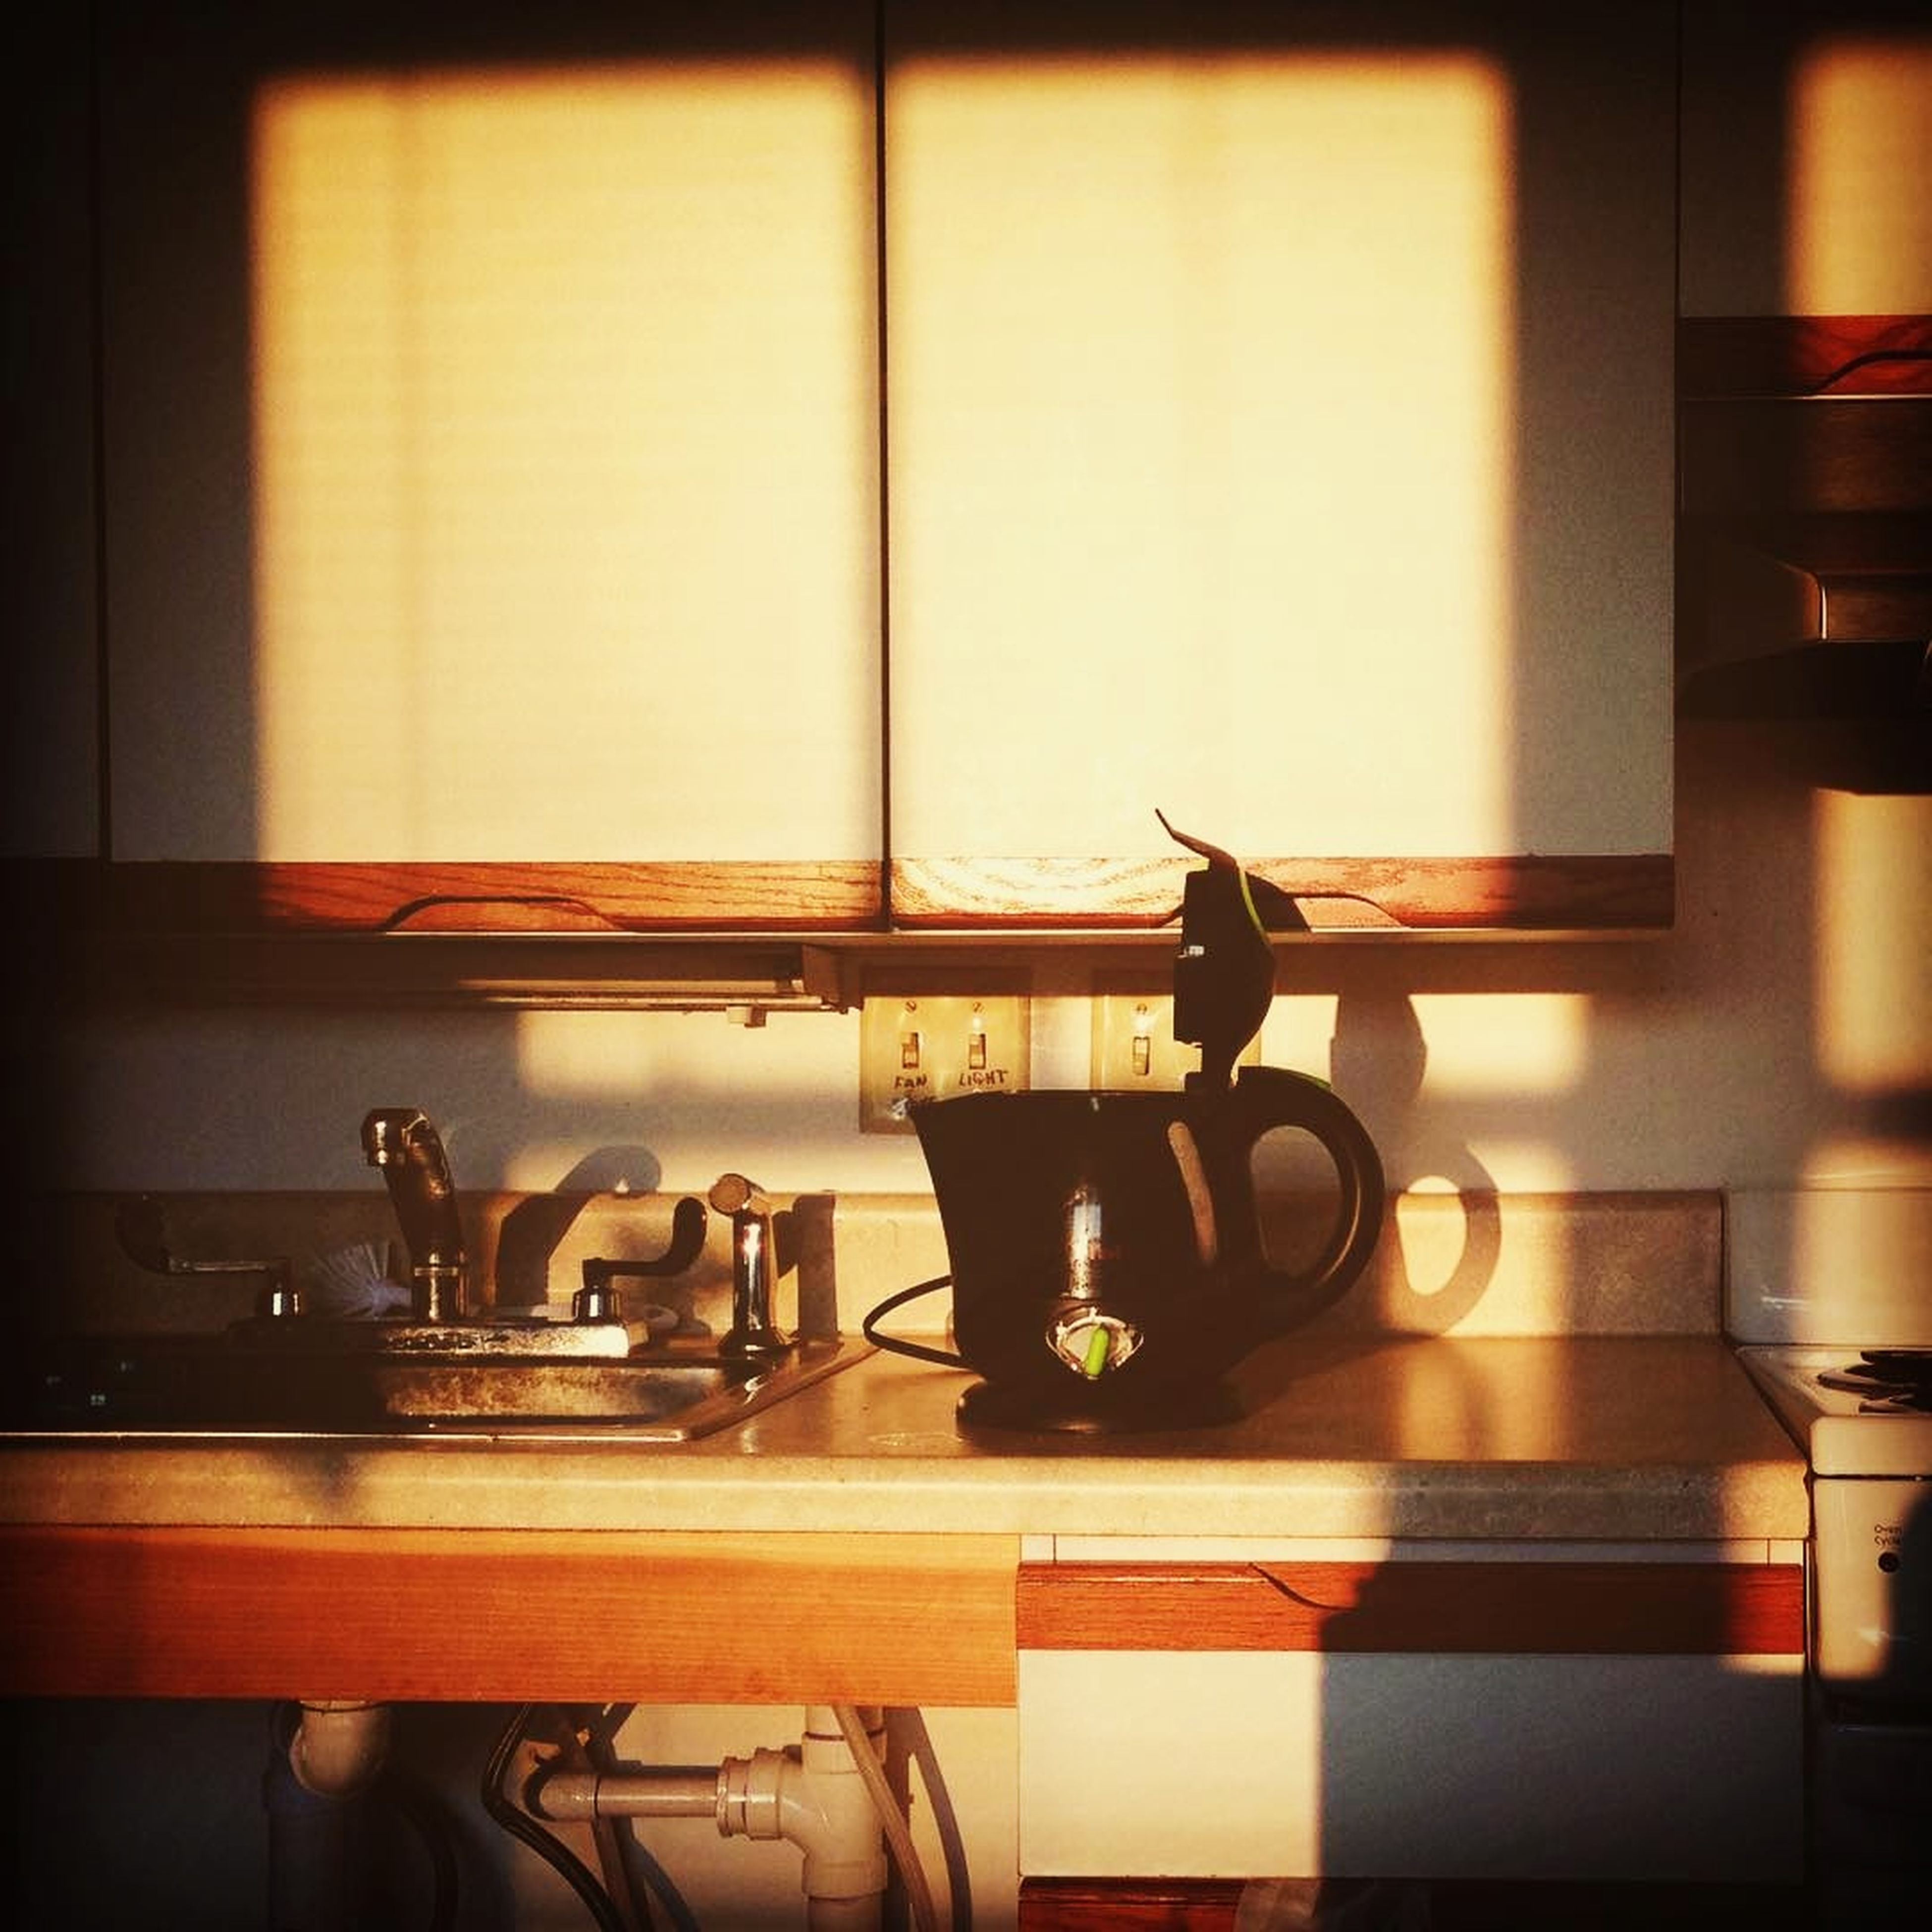 domestic kitchen, kitchen, indoors, domestic room, home interior, no people, kitchen counter, shelf, stove, neat, home showcase interior, cabinet, day